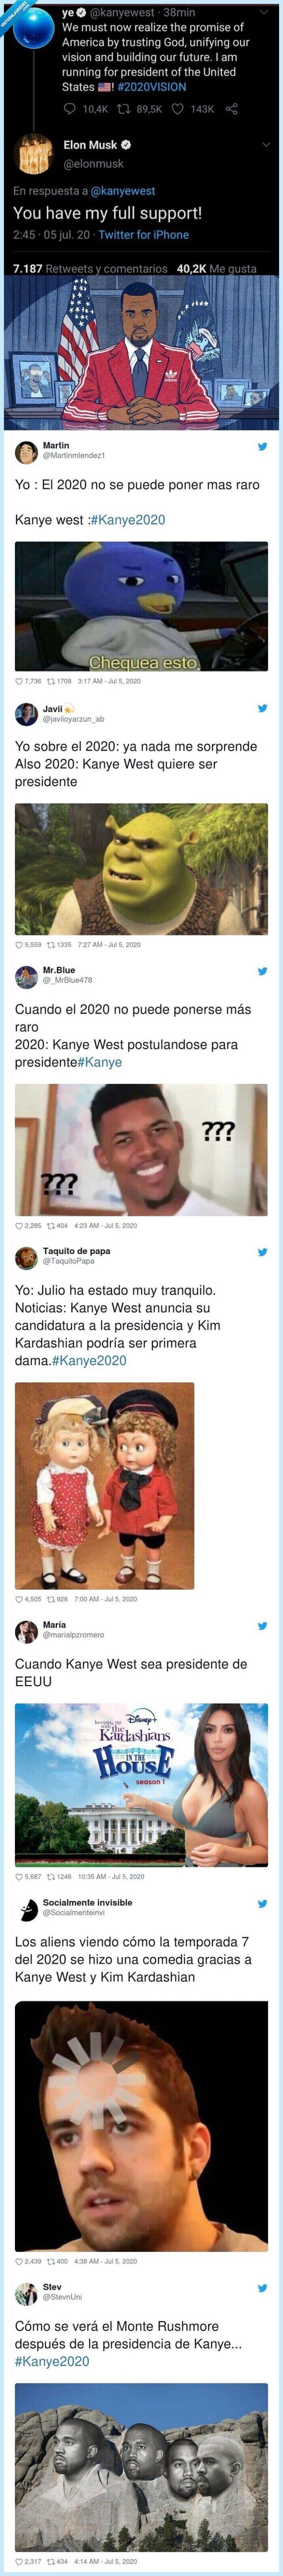 candidatura,eeuu,kanye,memes,presidente,reacciones,usa,west